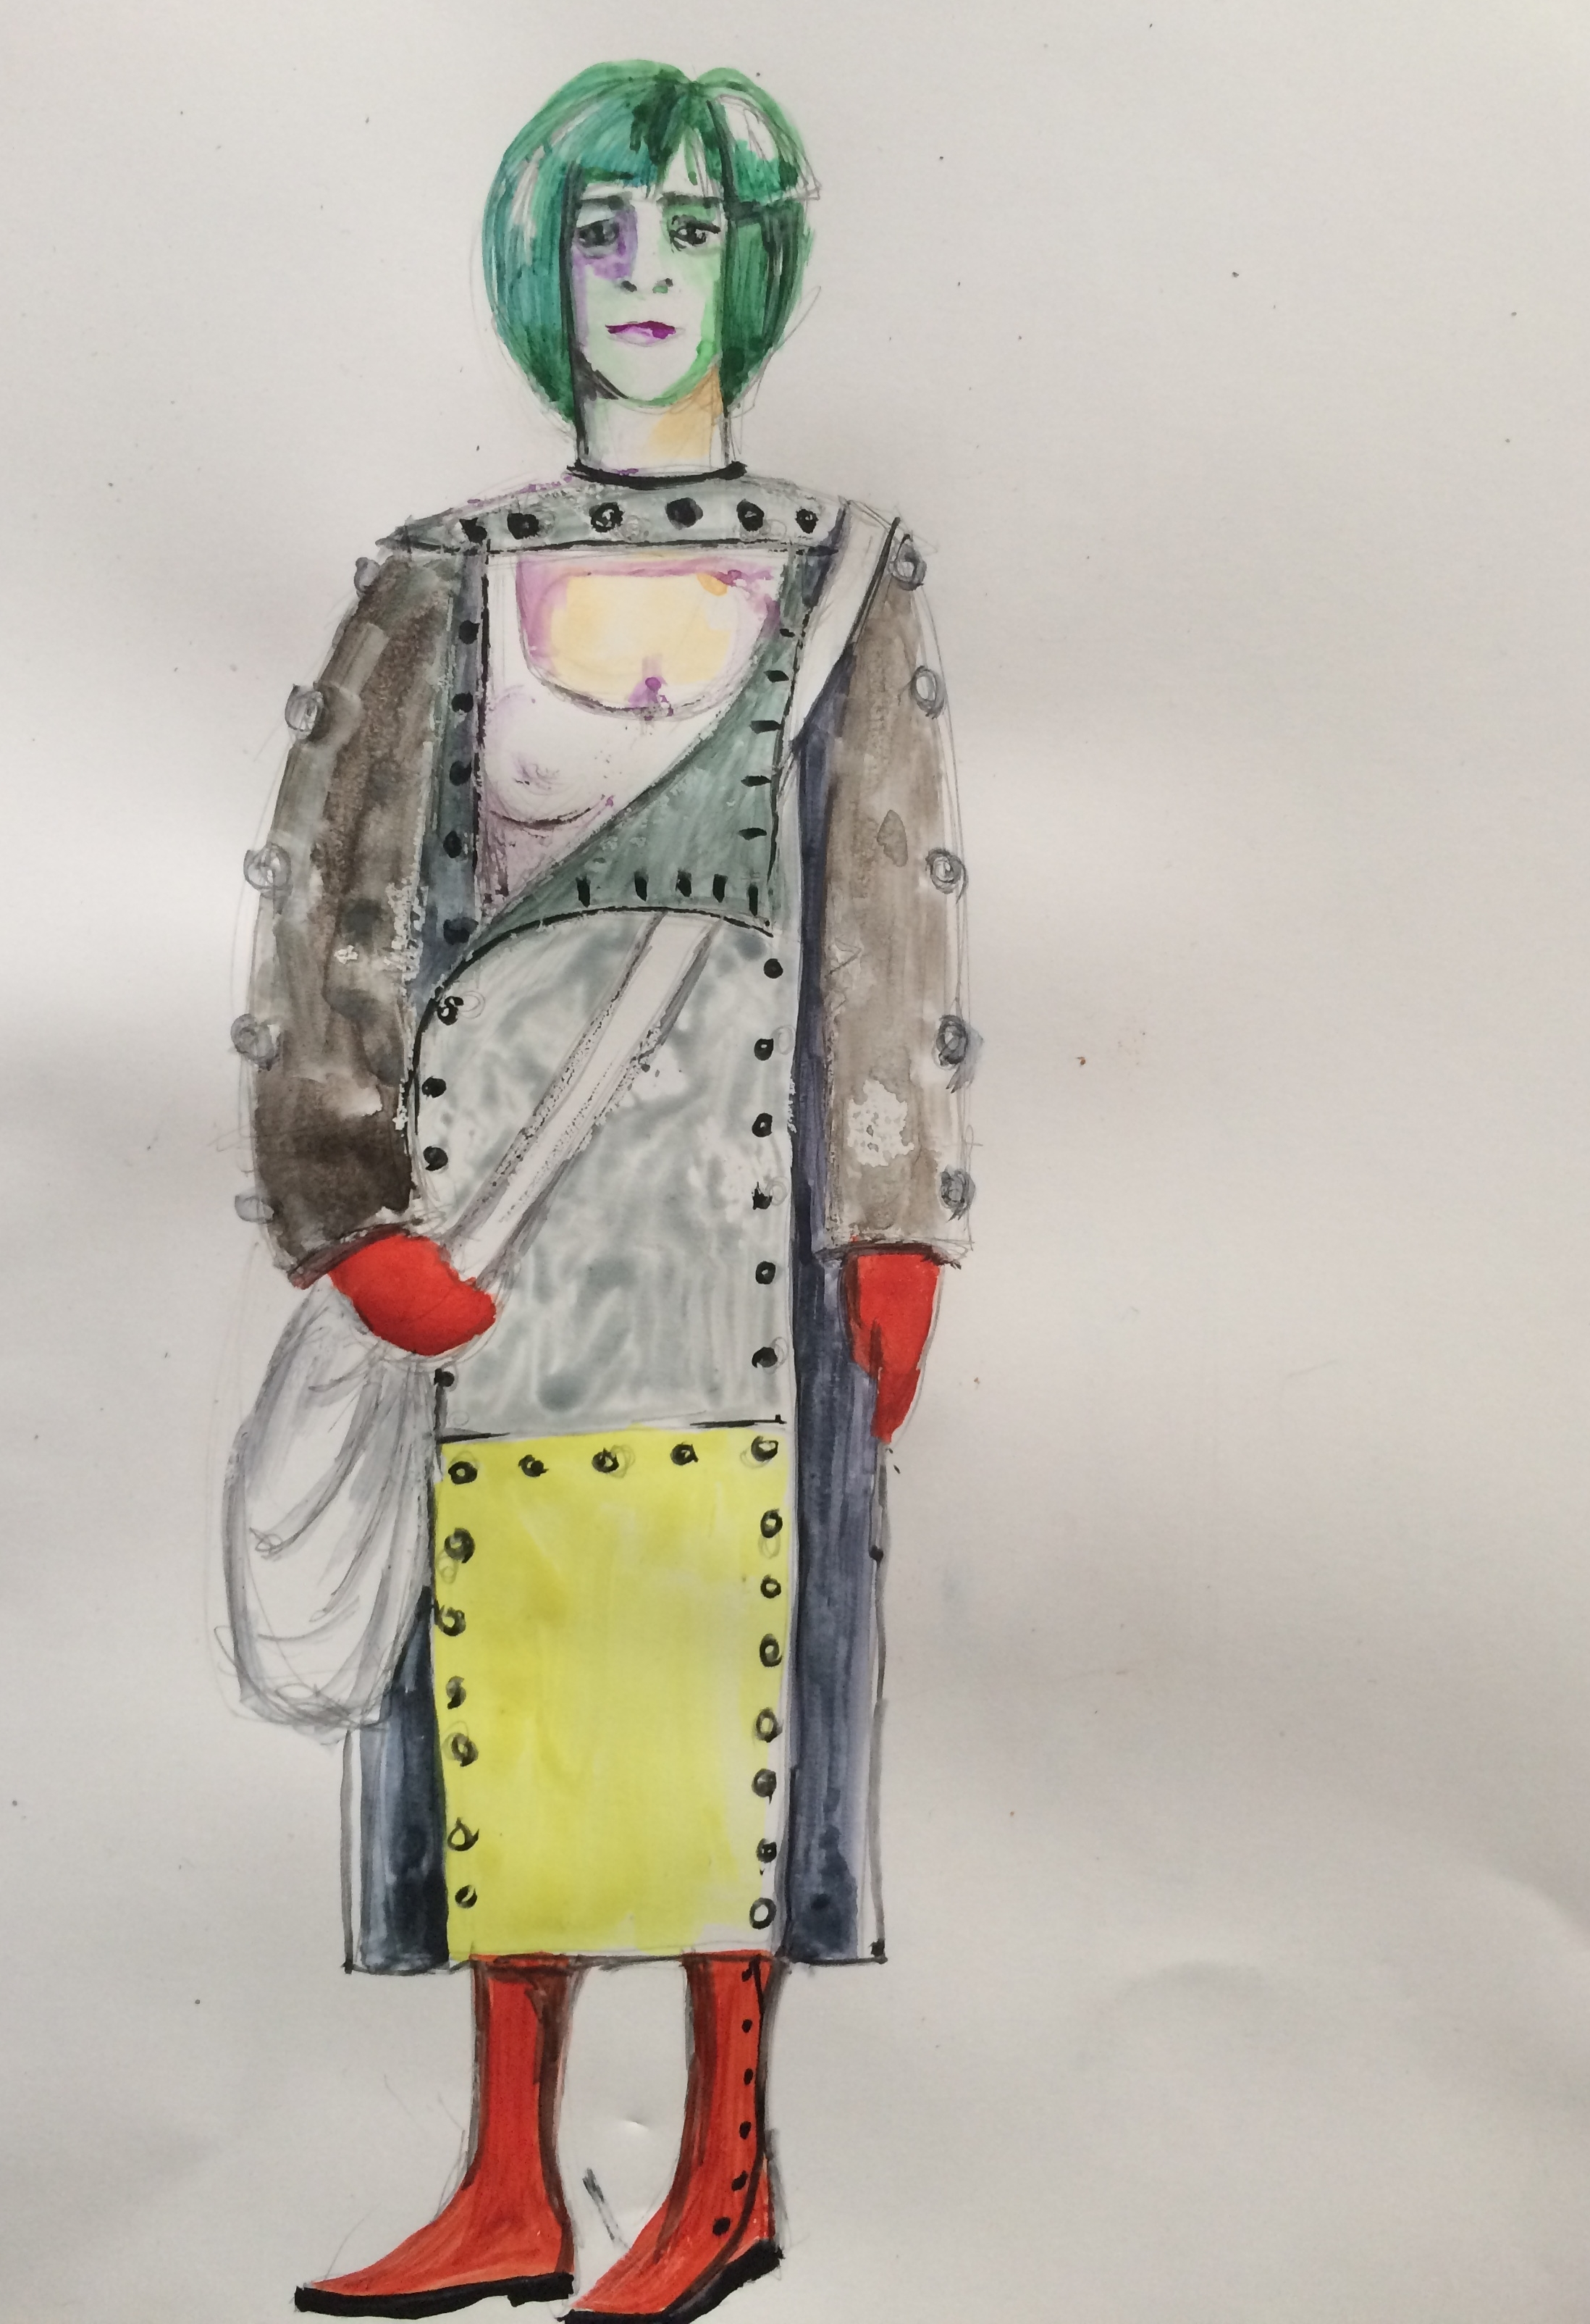 Jane Doe, act II. Costume sketch by Olga Maslova